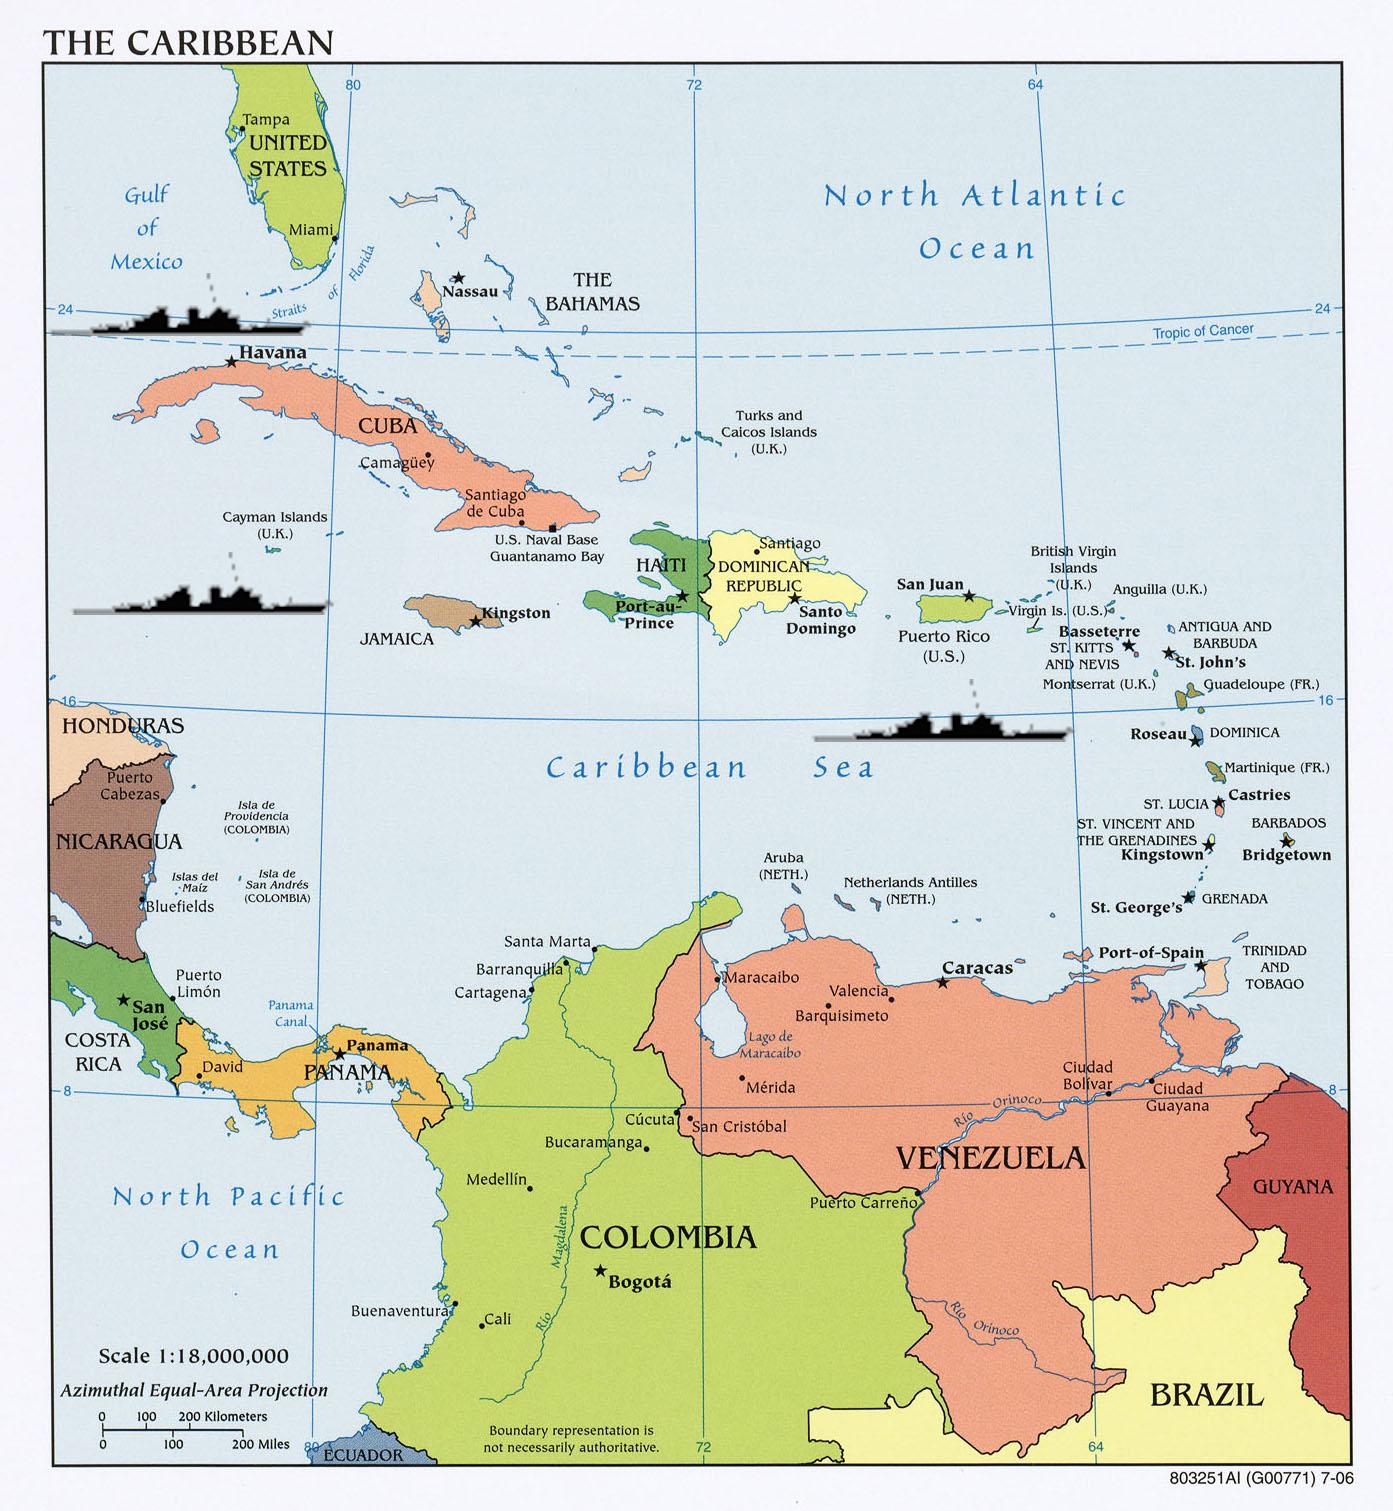 Caribbean: EagleSpeak: Sea Lines Of Communication Or Sea Lanes